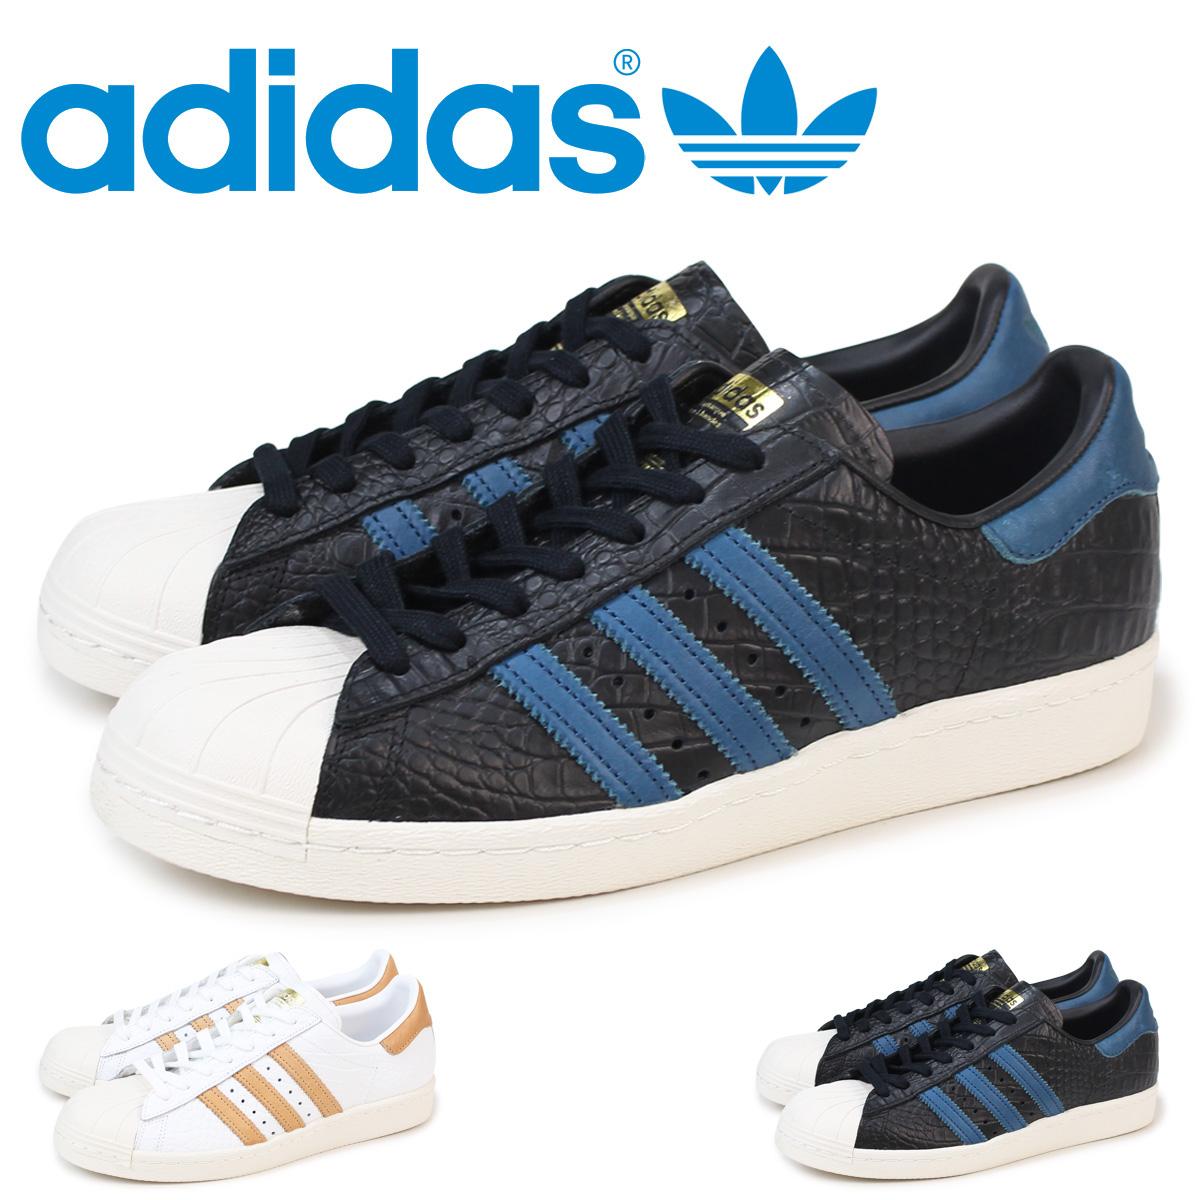 new arrivals 37aeb 22774 adidas superstar Adidas Originals sneakers SUPERSTAR 80S men BB2228 BB2229  shoes